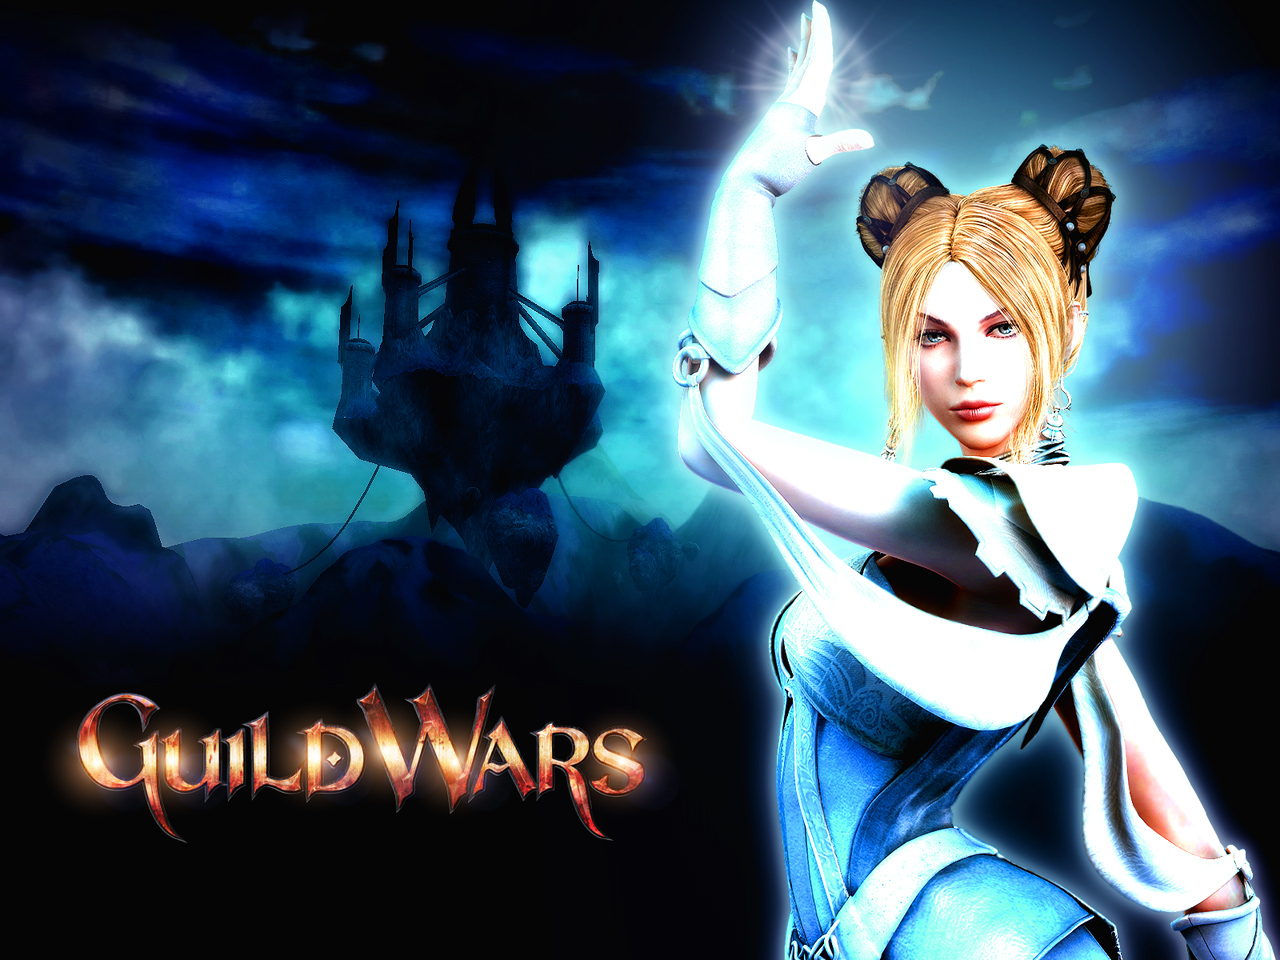 guildwars wallpaper highres-elementalist-1280